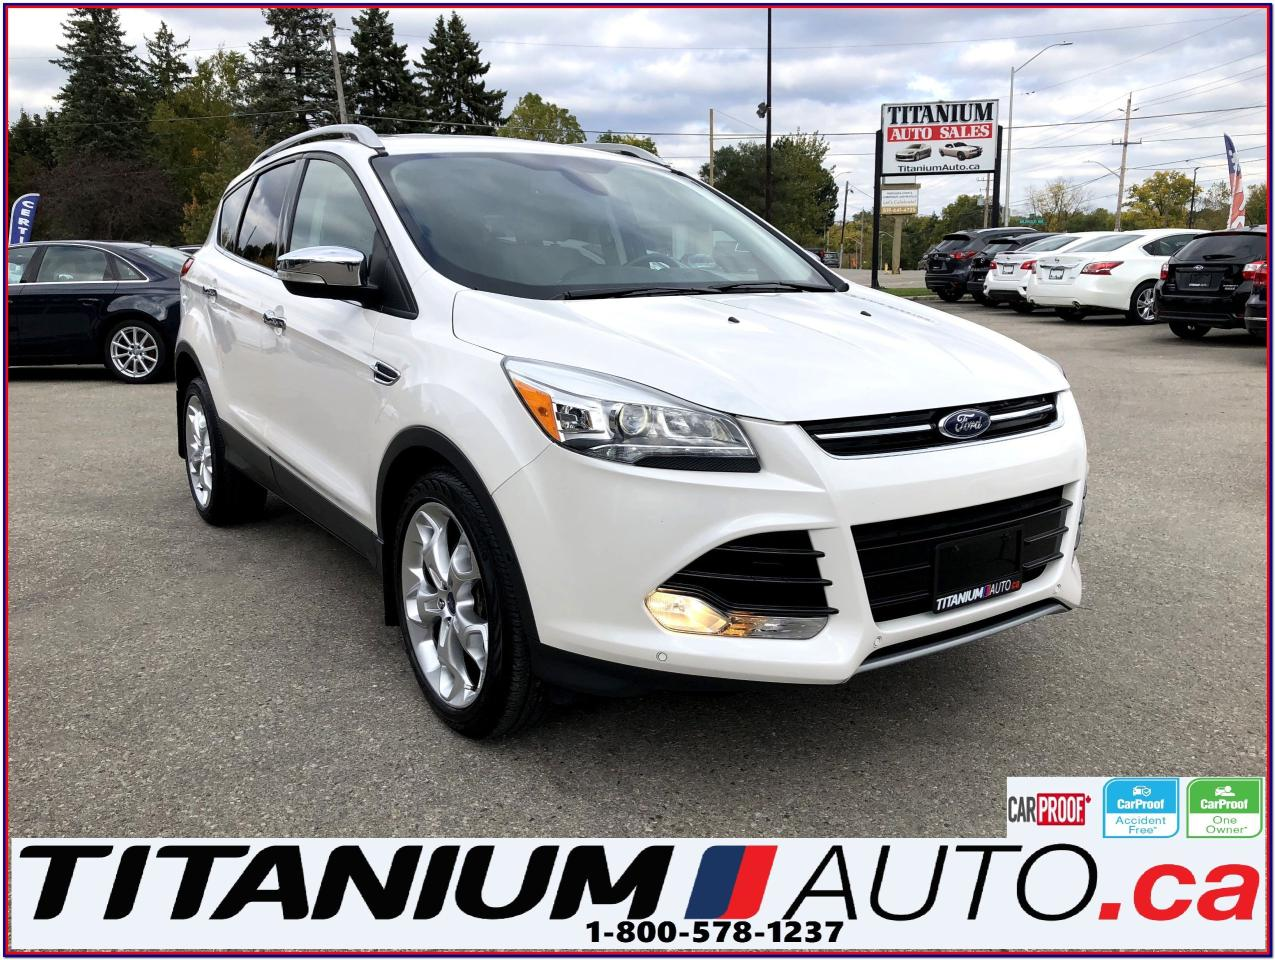 2015 Ford Escape Titanium-4WD-GPS-Camera-Pano Roof-Blind Spot-Leath